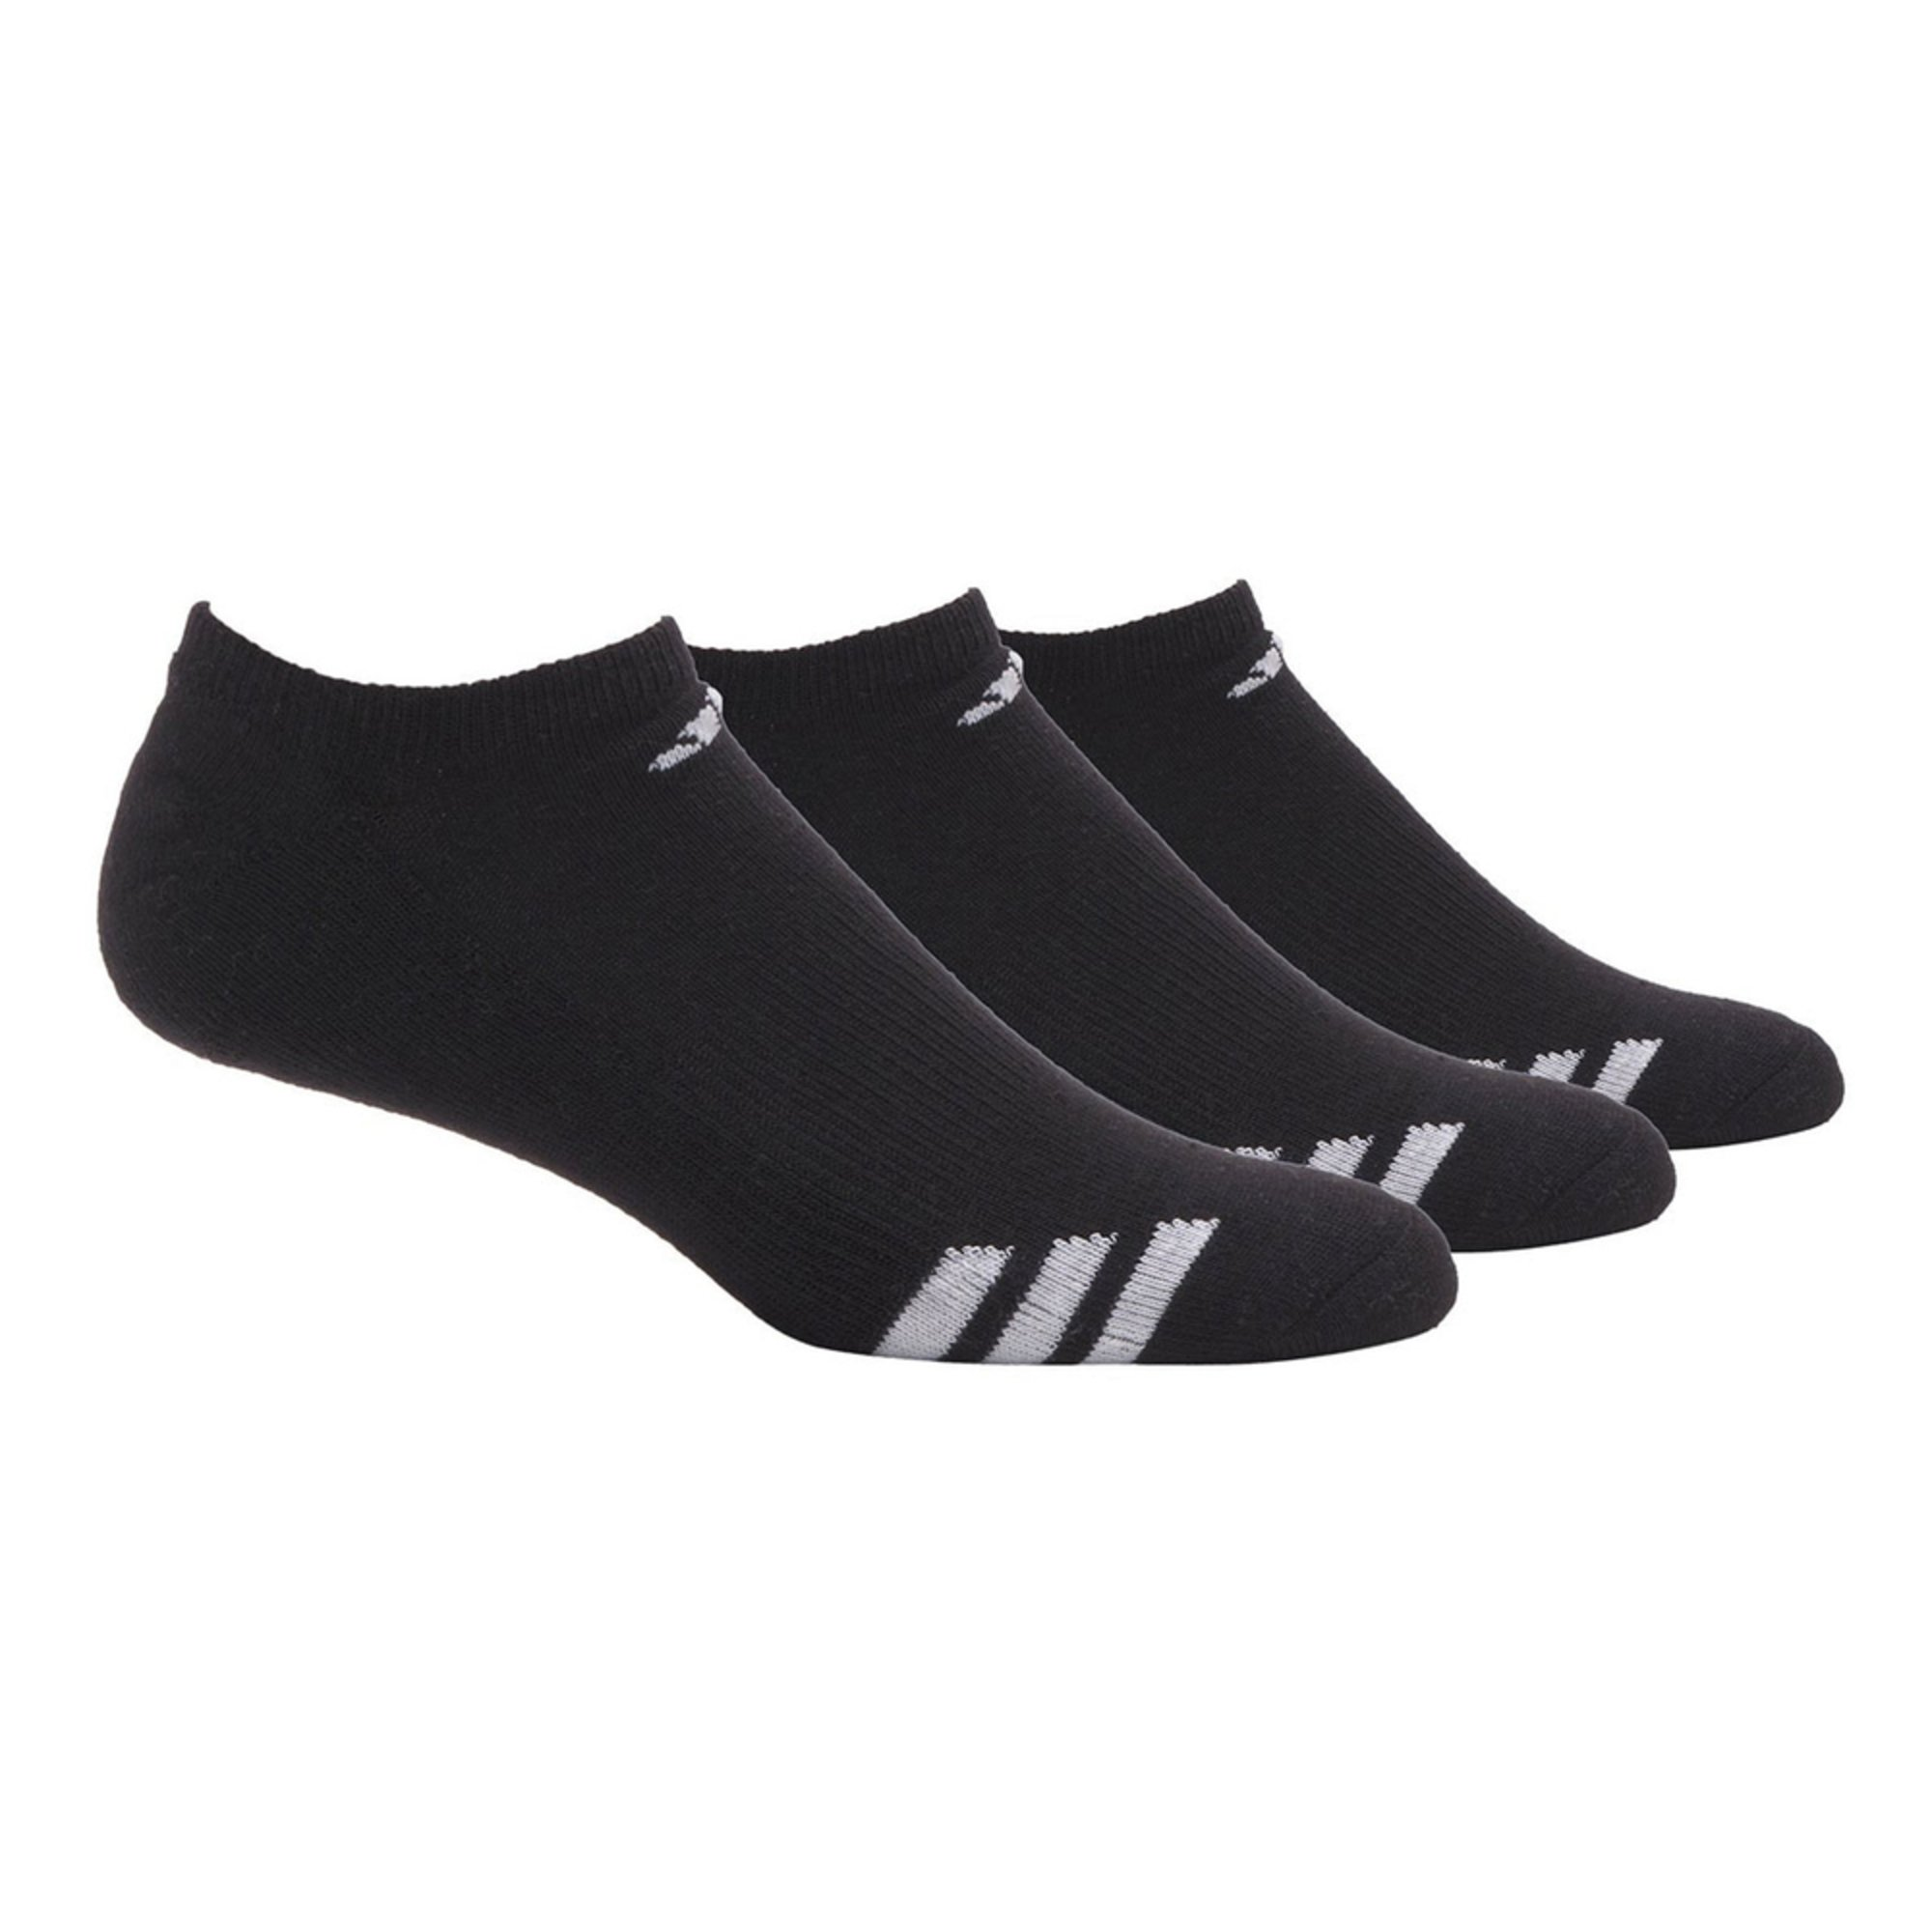 super popular 63e6c 65f8f Adidas Men's Climalite Cushion 3-pack Low Cut Socks | Active ...